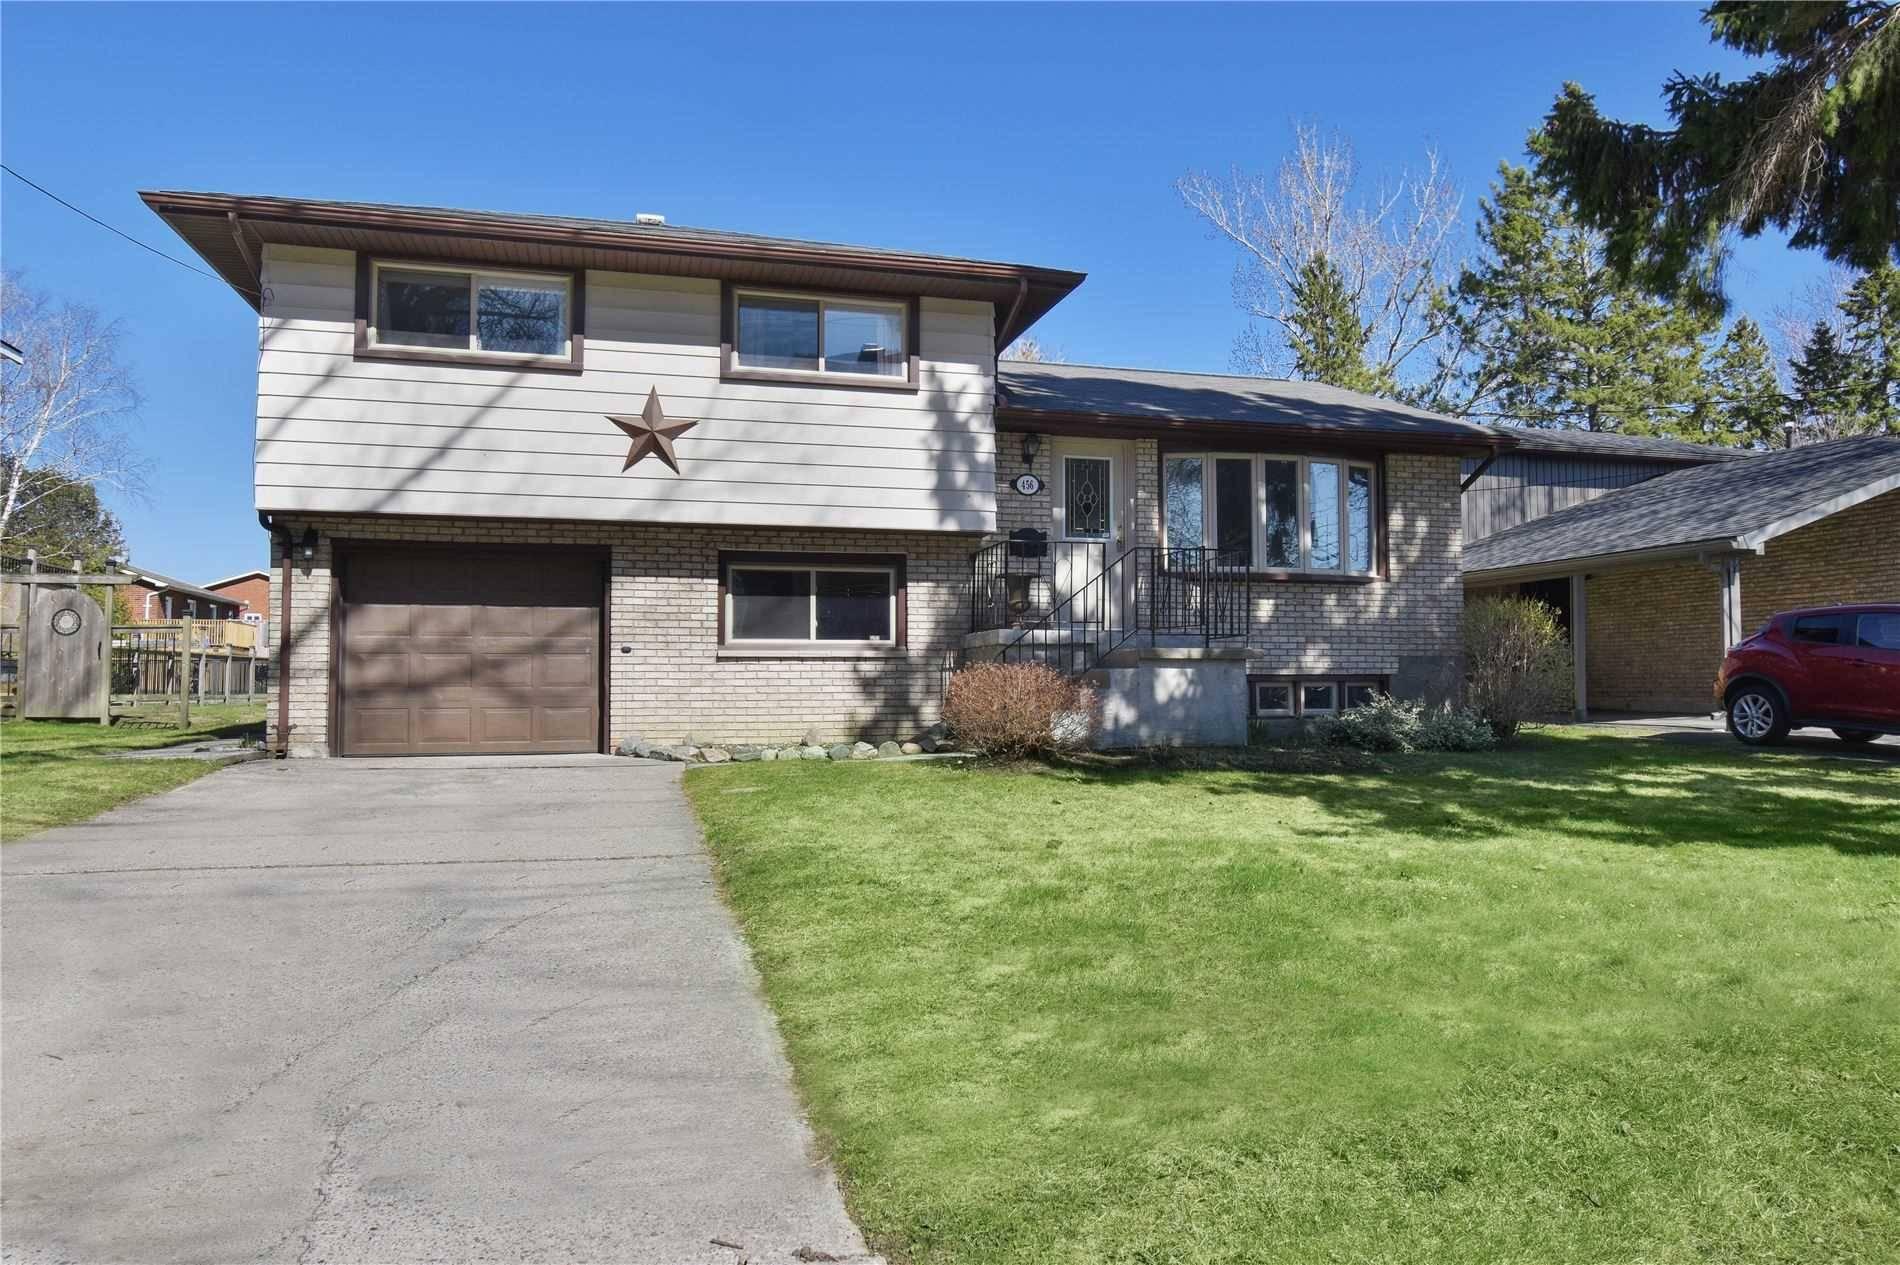 House for sale at 456 Burnham St Cobourg Ontario - MLS: X4707837